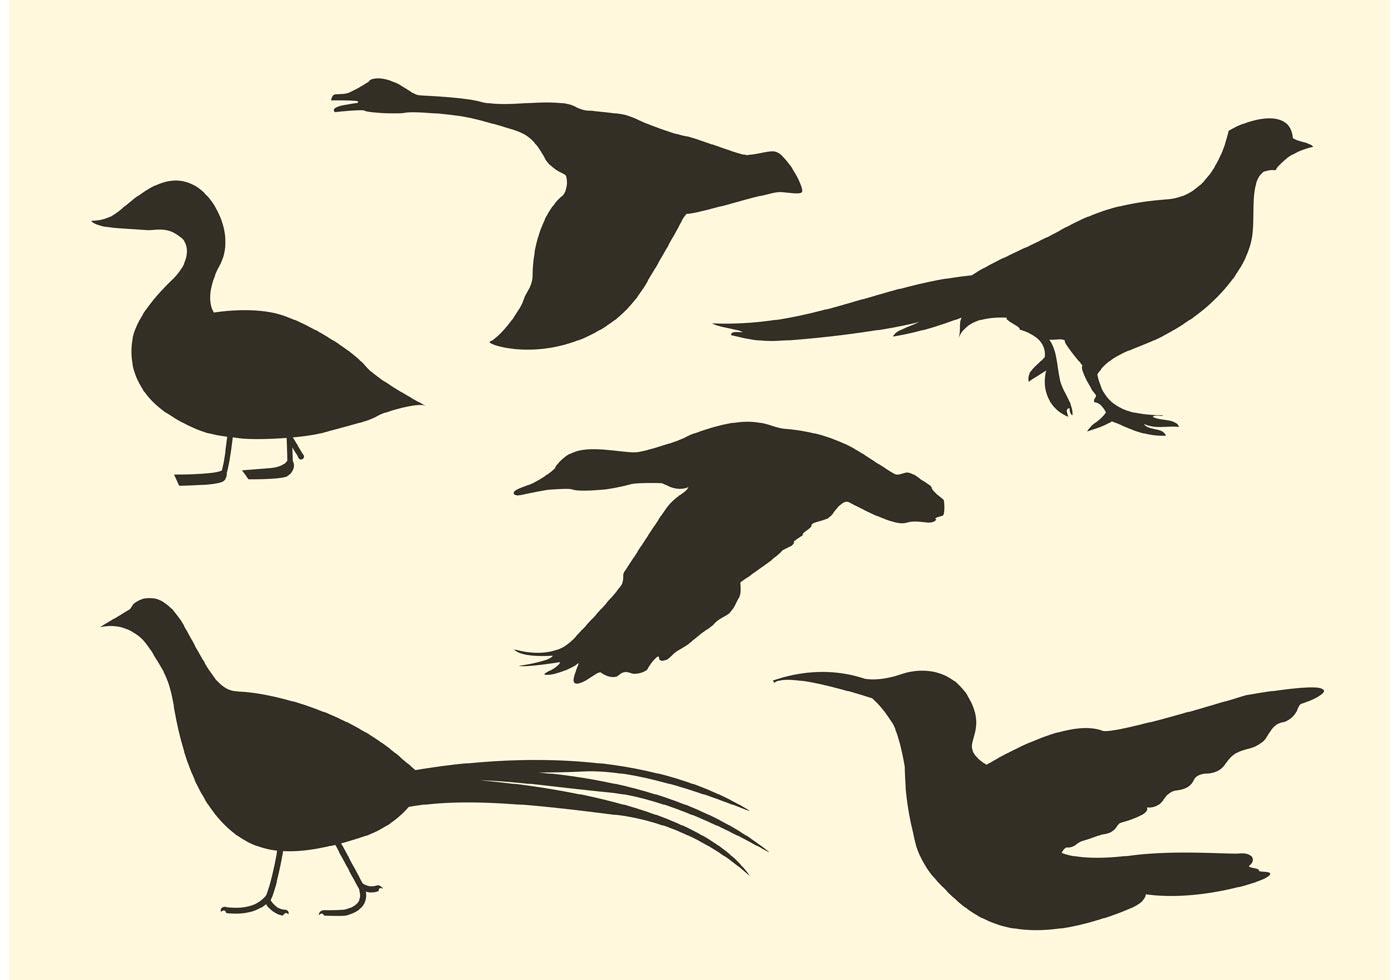 Free Bird Vector Silhouette Pack - Download Free Vectors, Clipart Graphics & Vector Art